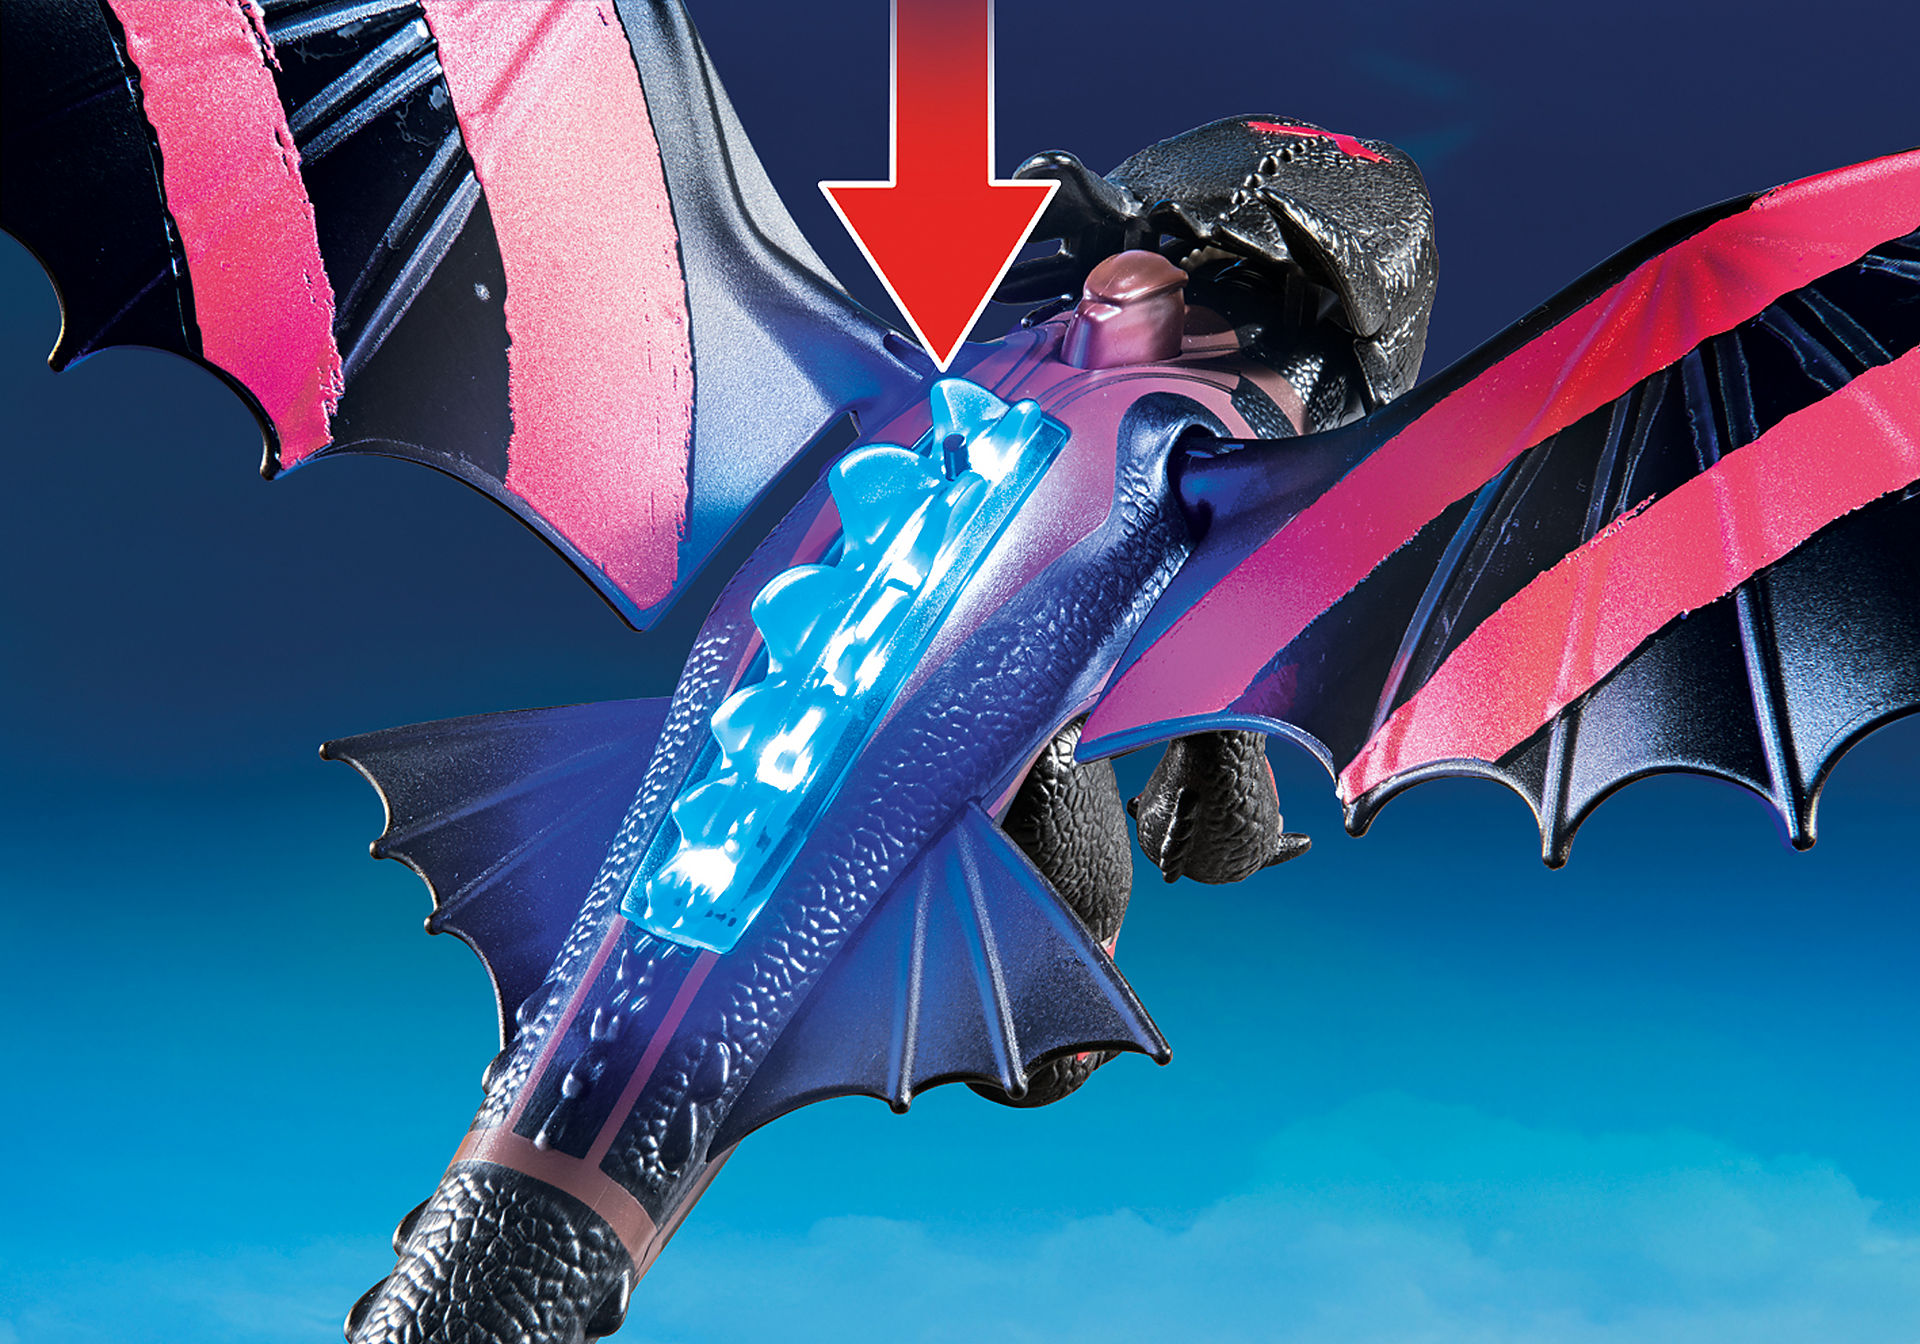 70727 Dragon Racing: Hikkie en Tandloos zoom image5